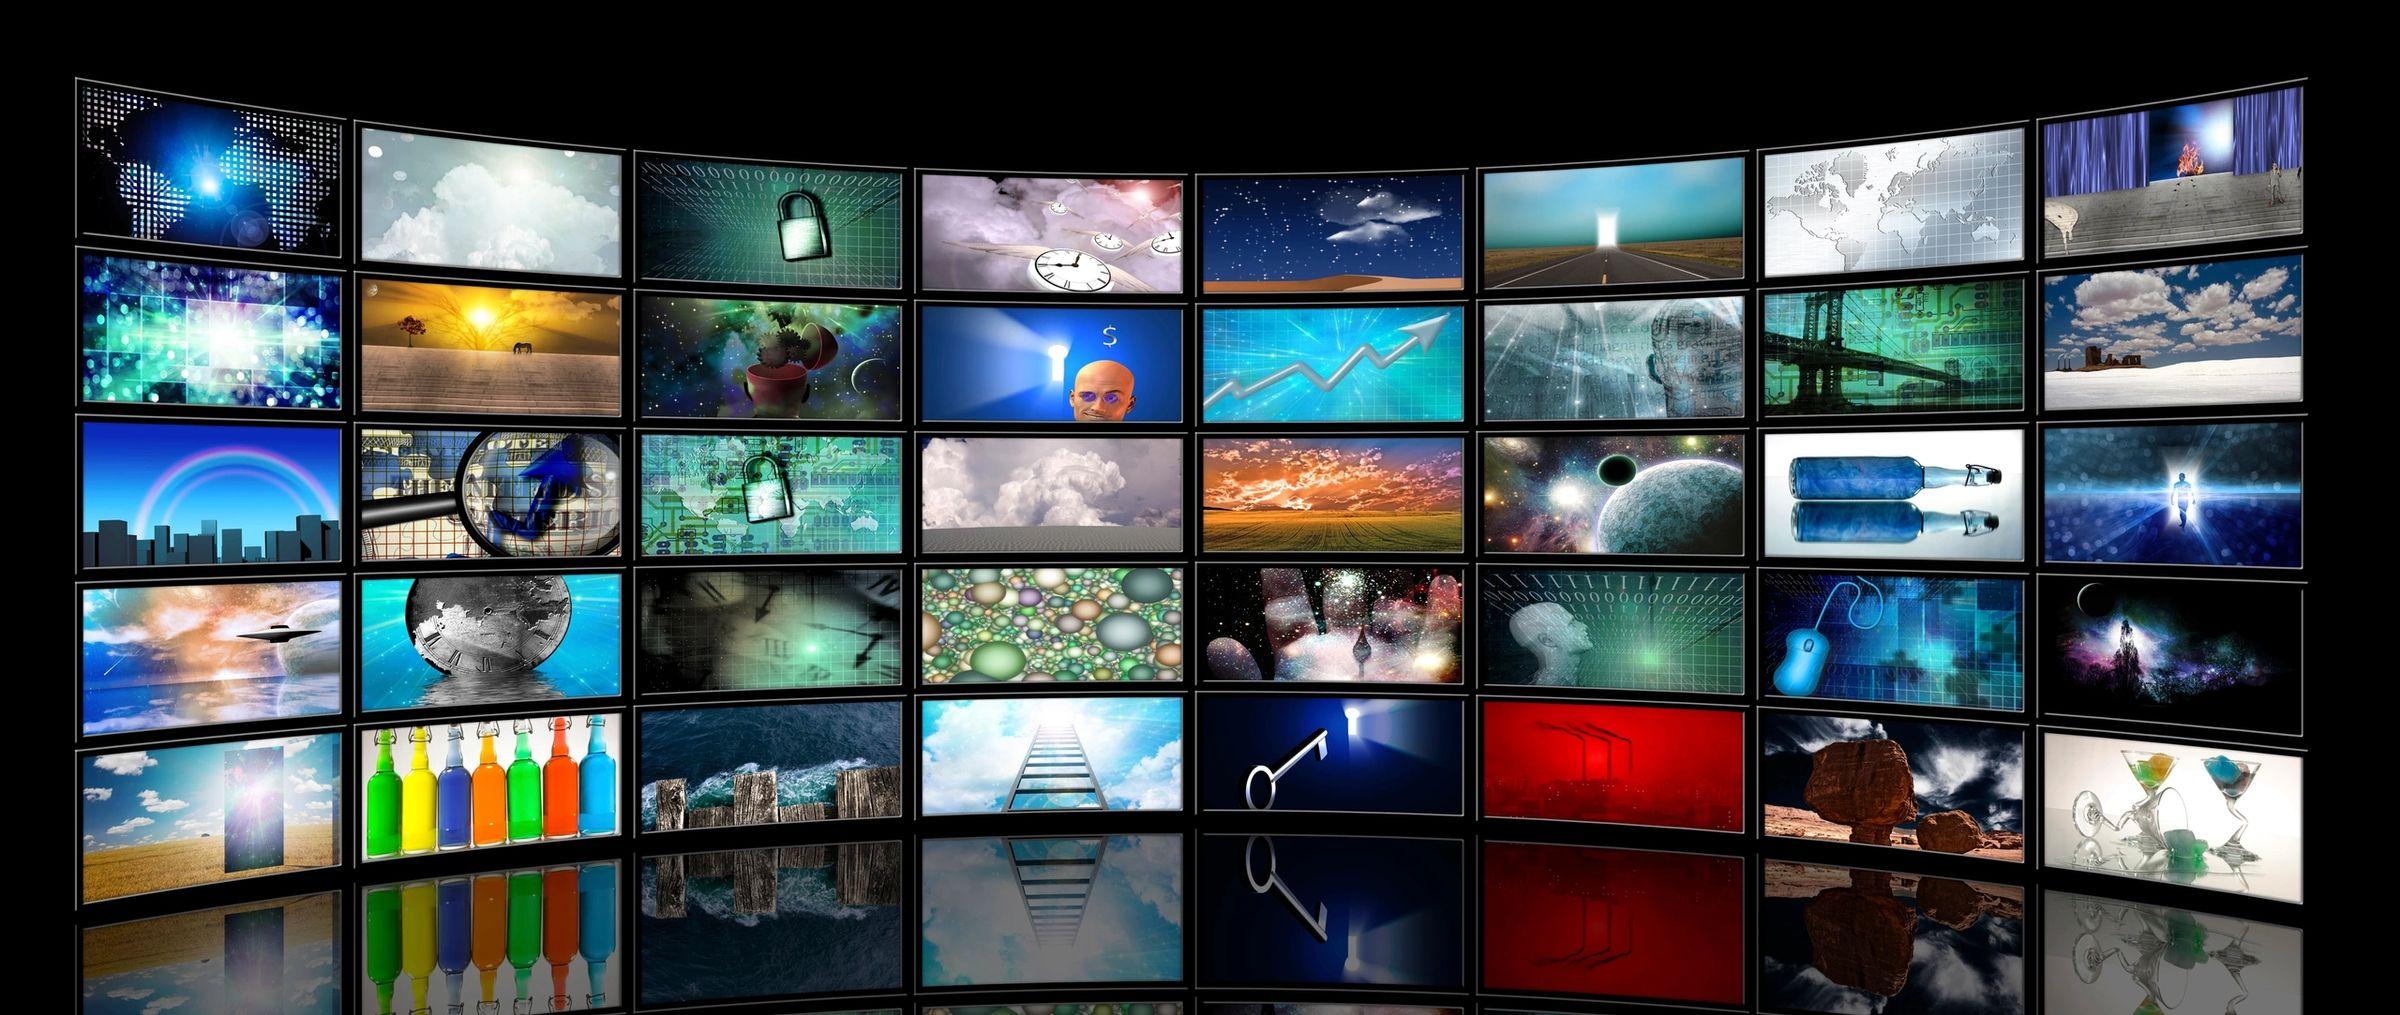 Business Risk Management Video Journalism Online